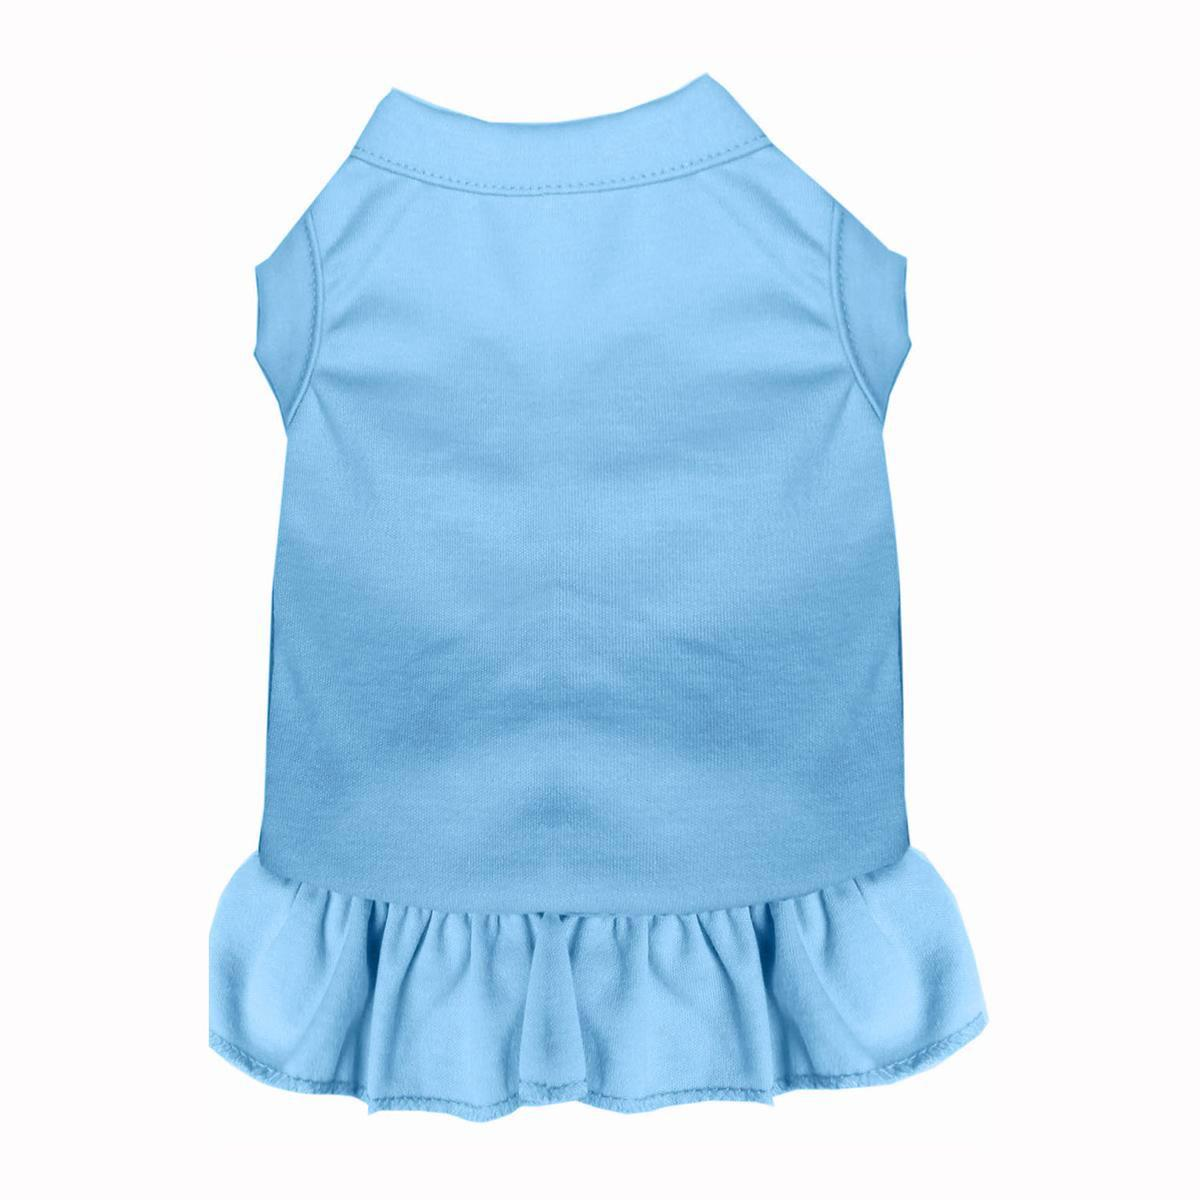 Plain Dog Dress - Baby Blue